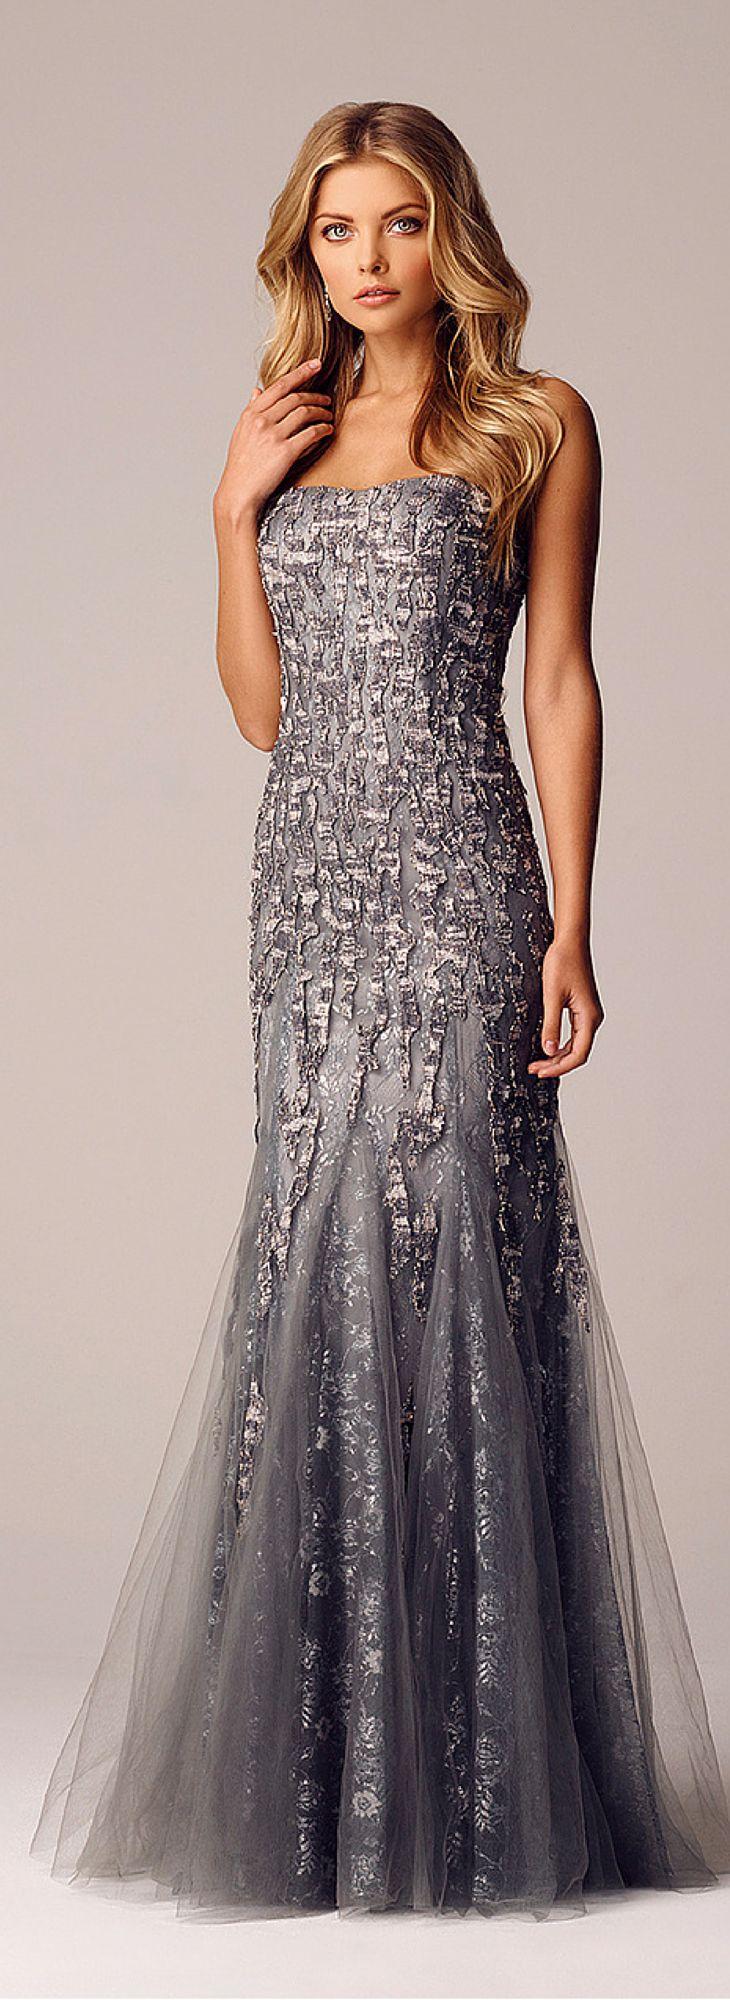 Alberto Makali - Prom, Gala, Ball Dress, Evening Gown